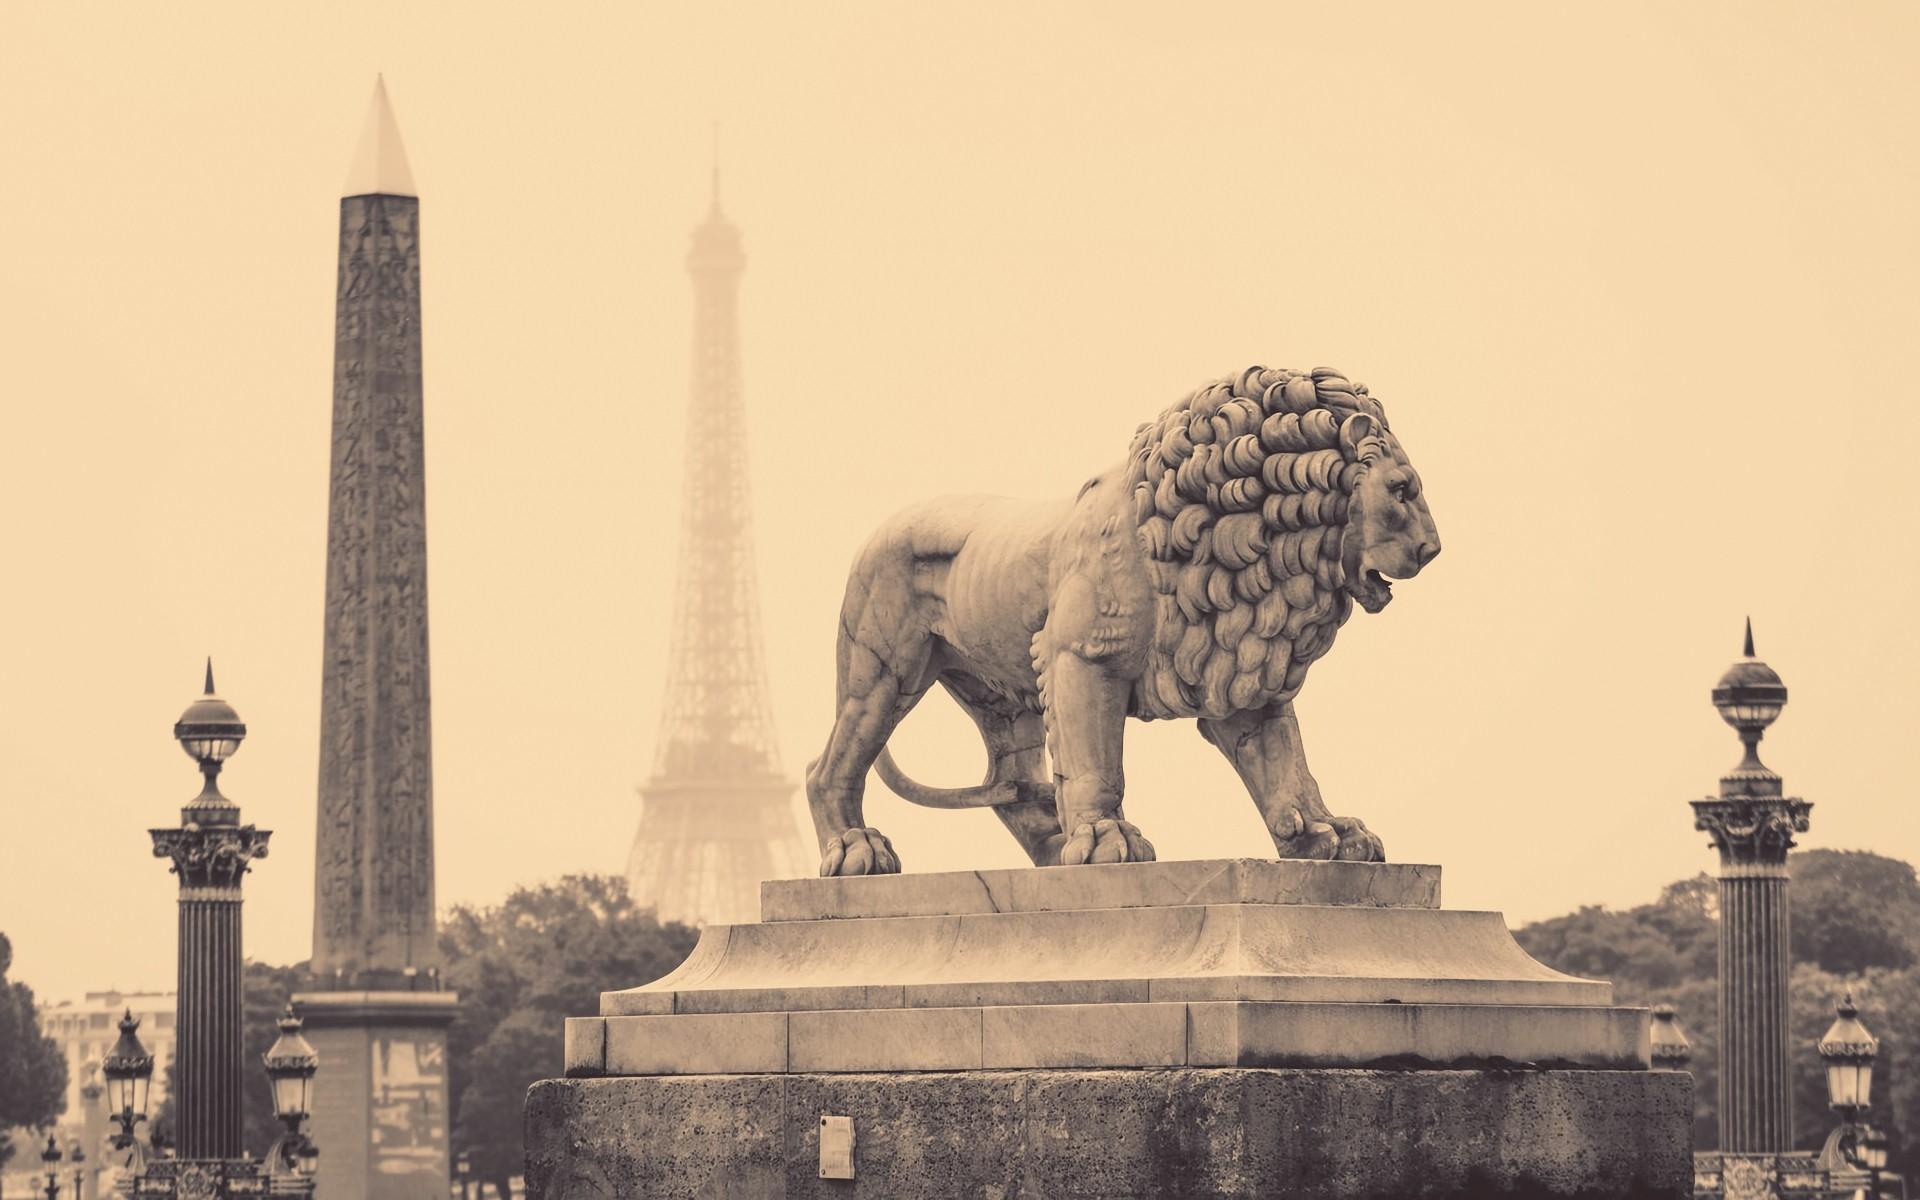 Wallpaper Lion Statue Street City France Paris Black And White 1920x1200 685682 Hd Wallpapers Wallhere